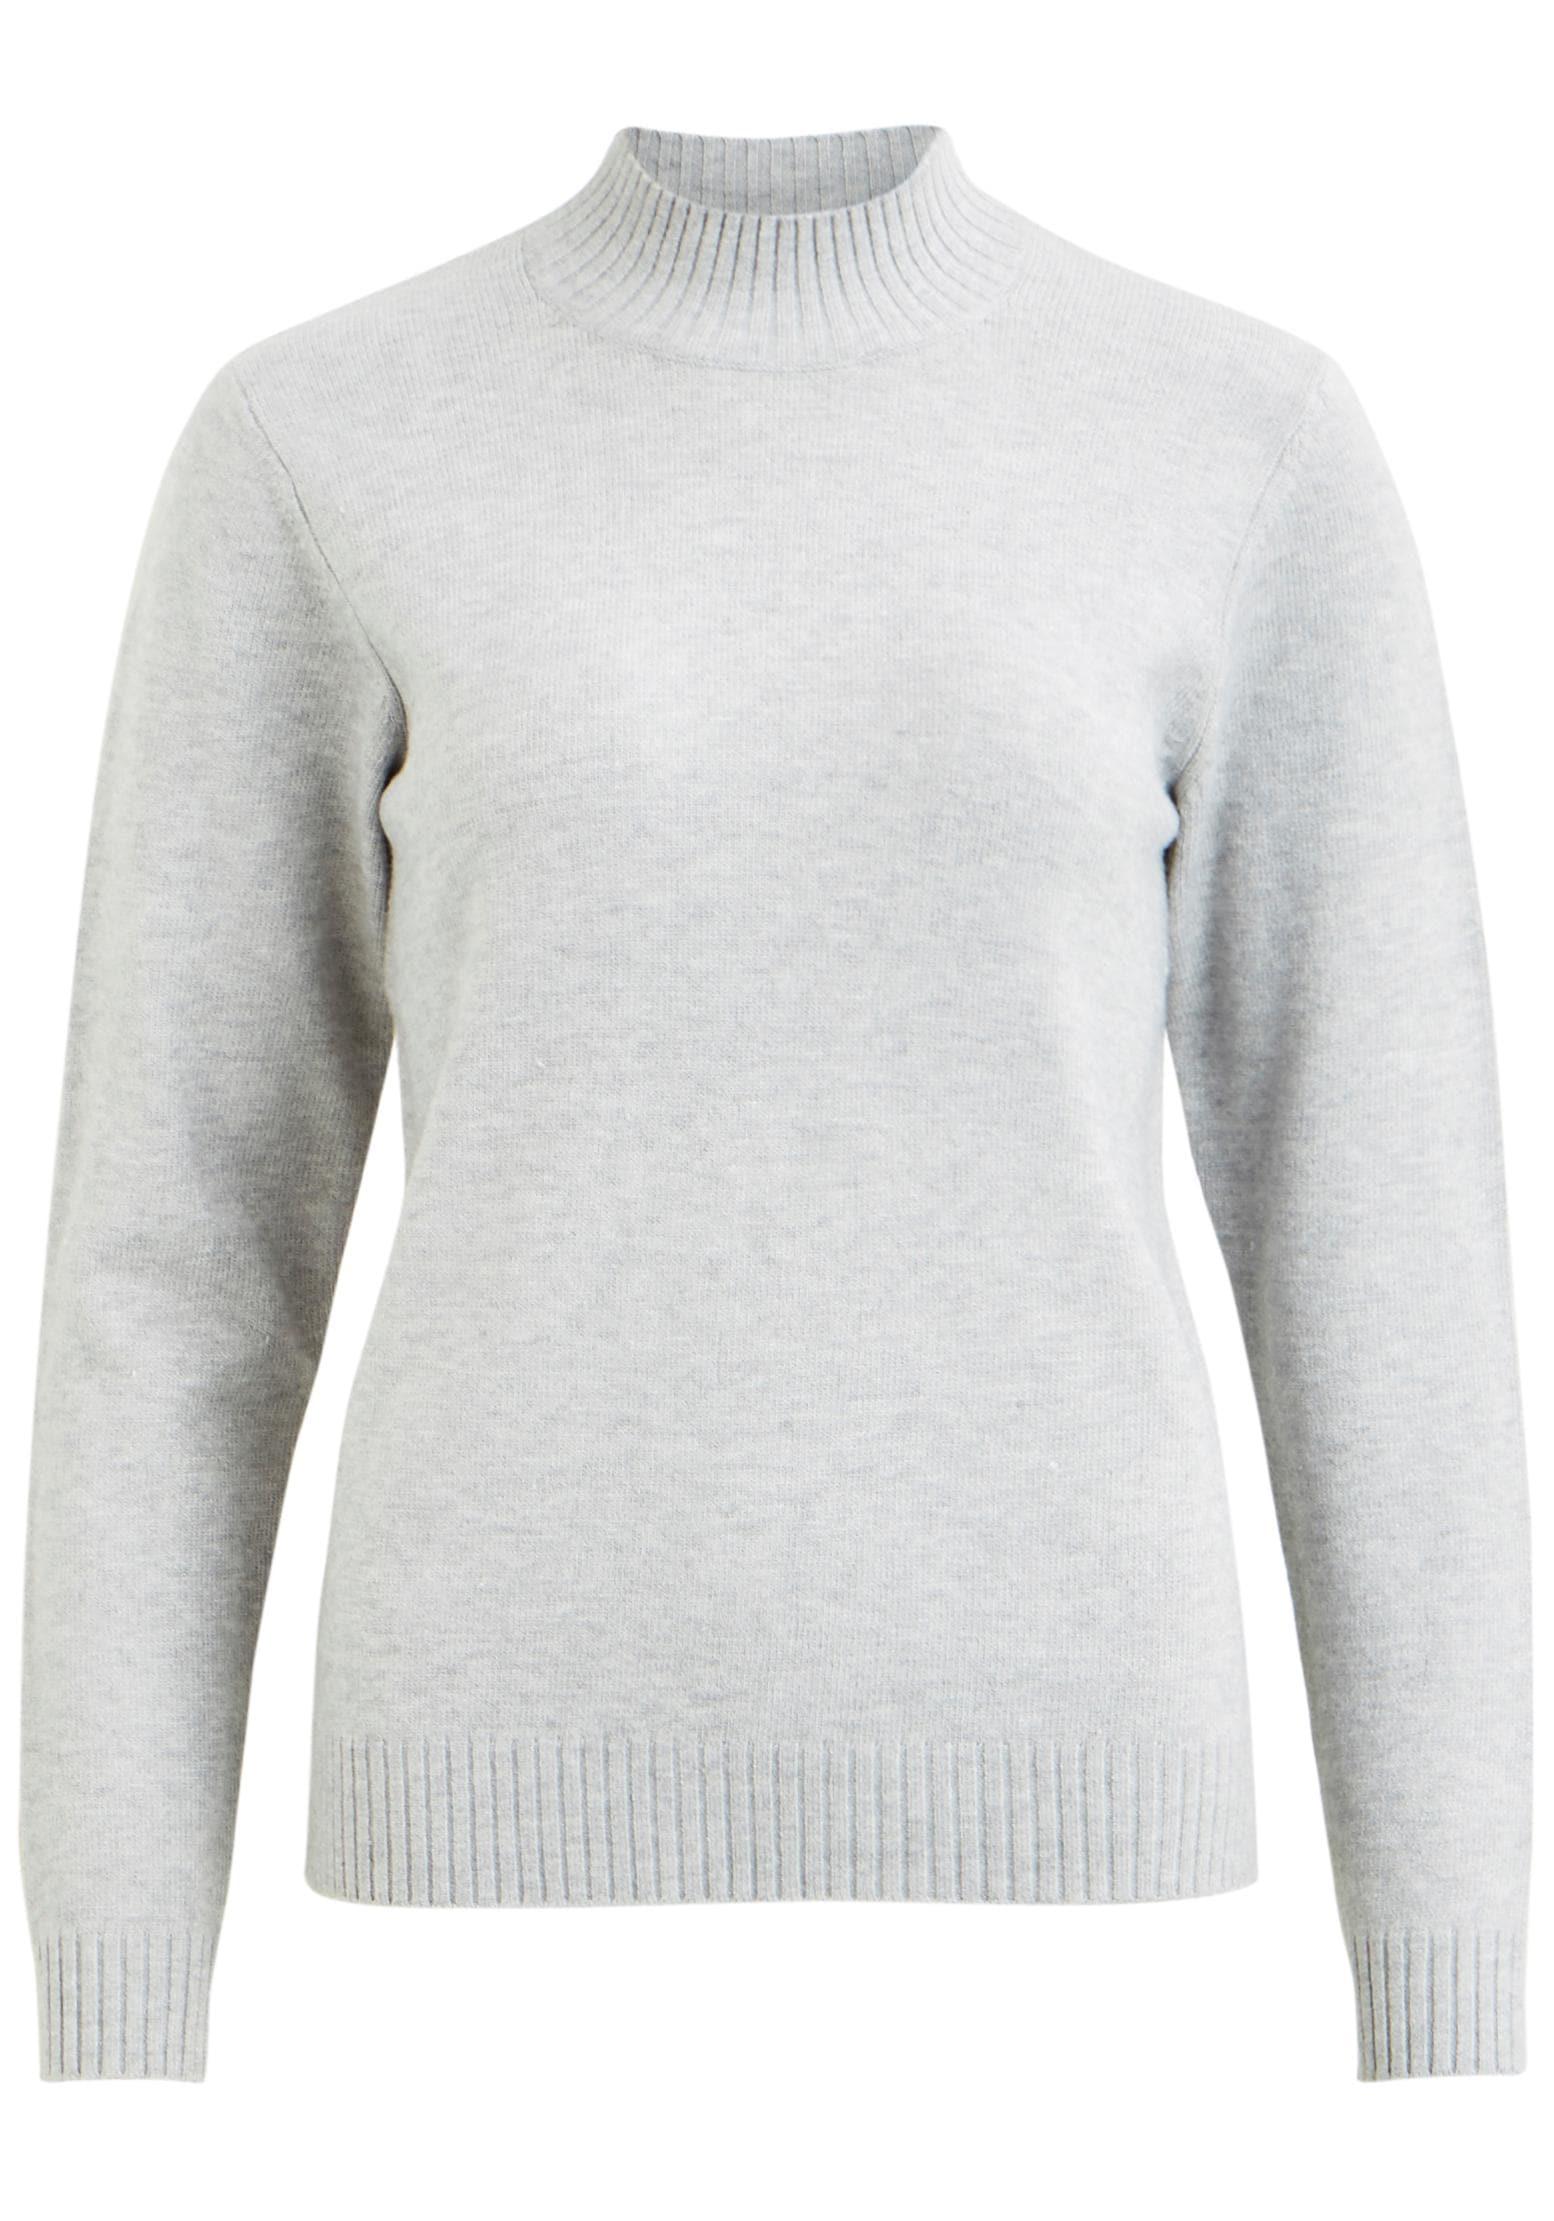 Vila Stehkragenpullover RIL | Bekleidung > Pullover > Stehkragenpullover | Grau | Vila